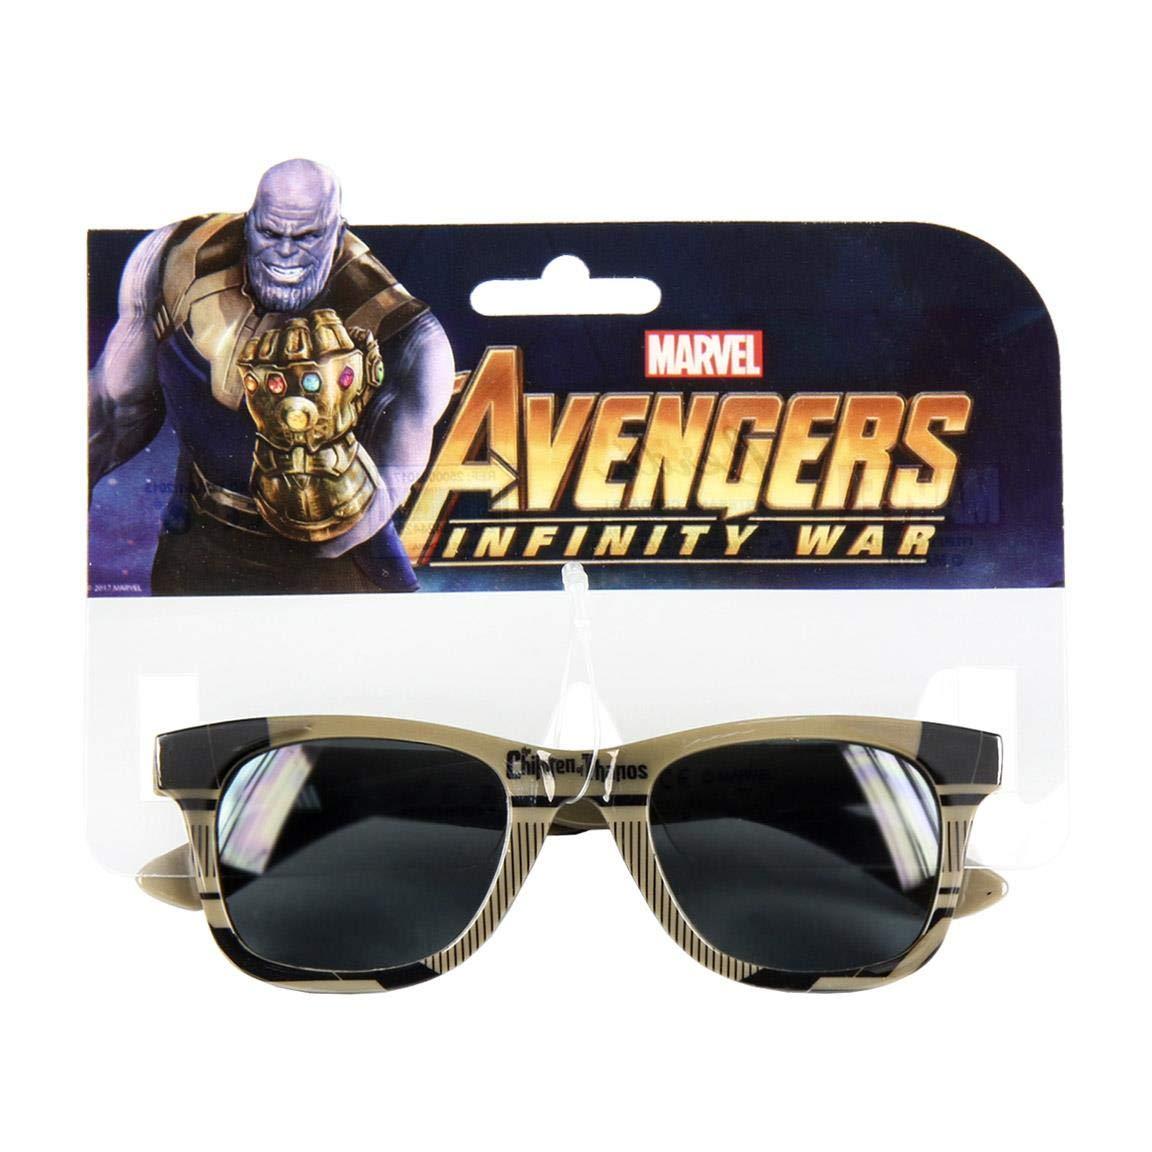 Negro Artesania Cerda Gafas De sol Avengers Thanos Occhiali da Sole Nero 52 Bambino